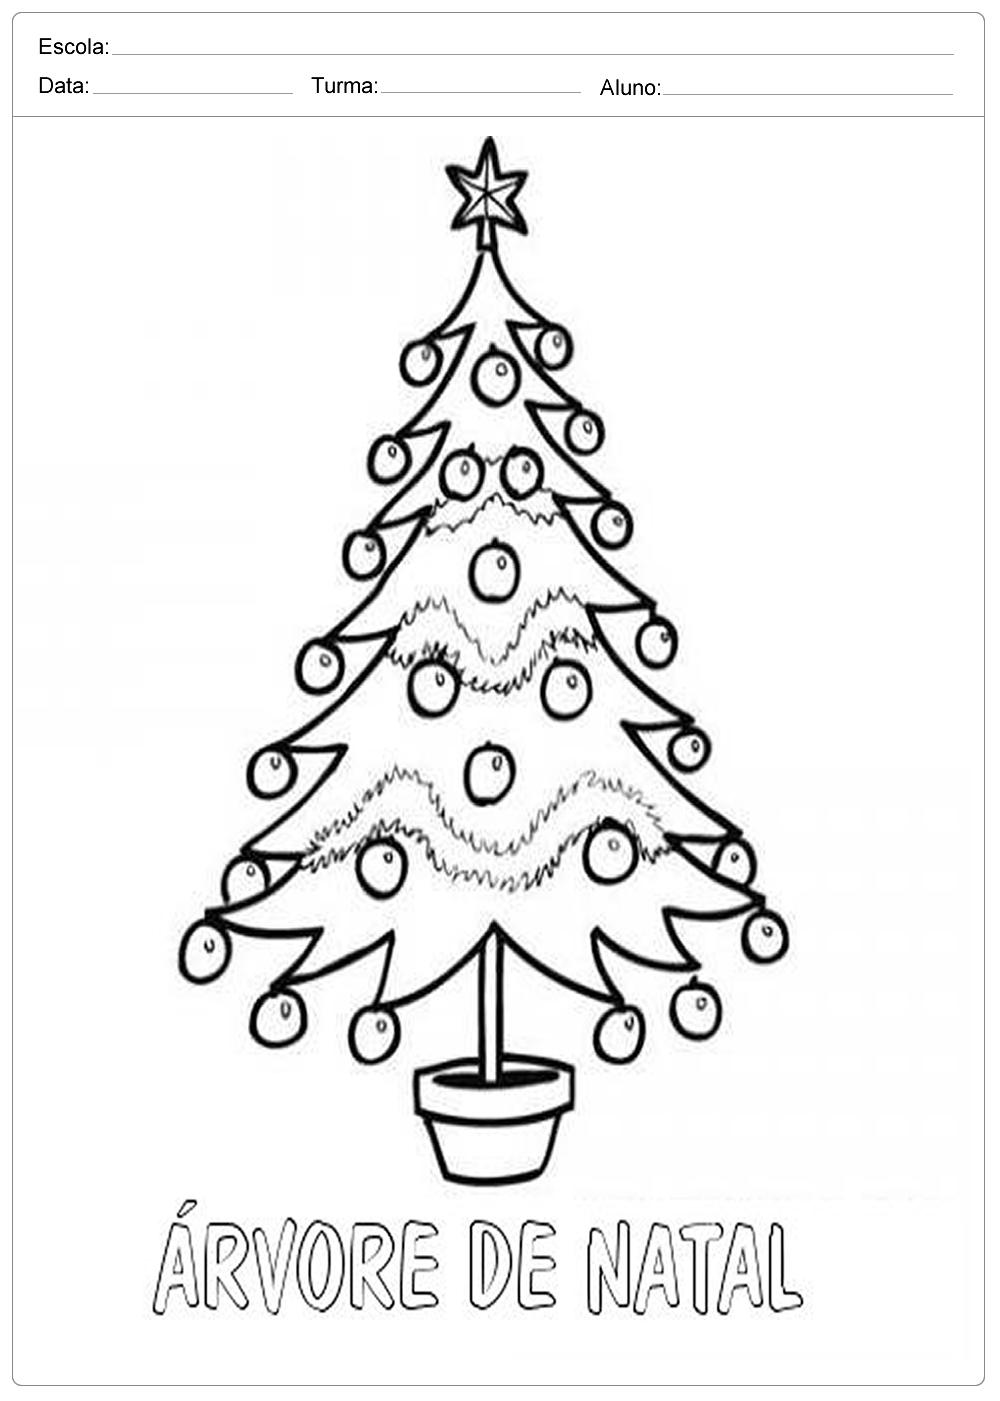 Desenhos Para Imprimir E Colorir Sobre O Natal Só Escola